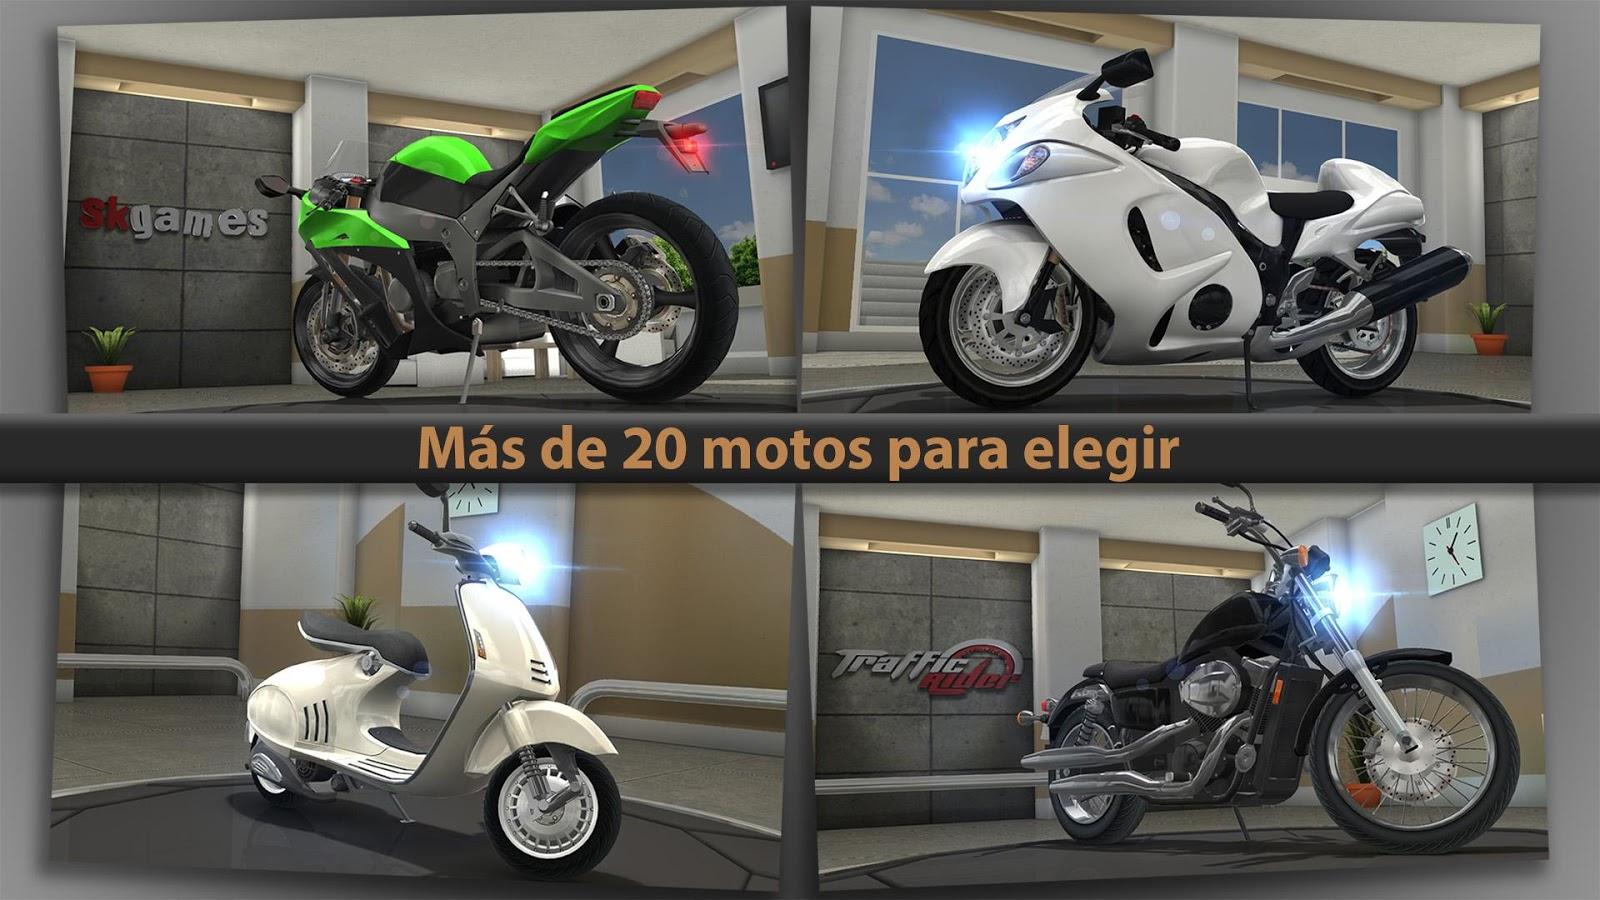 hasta 20 motos para elegir